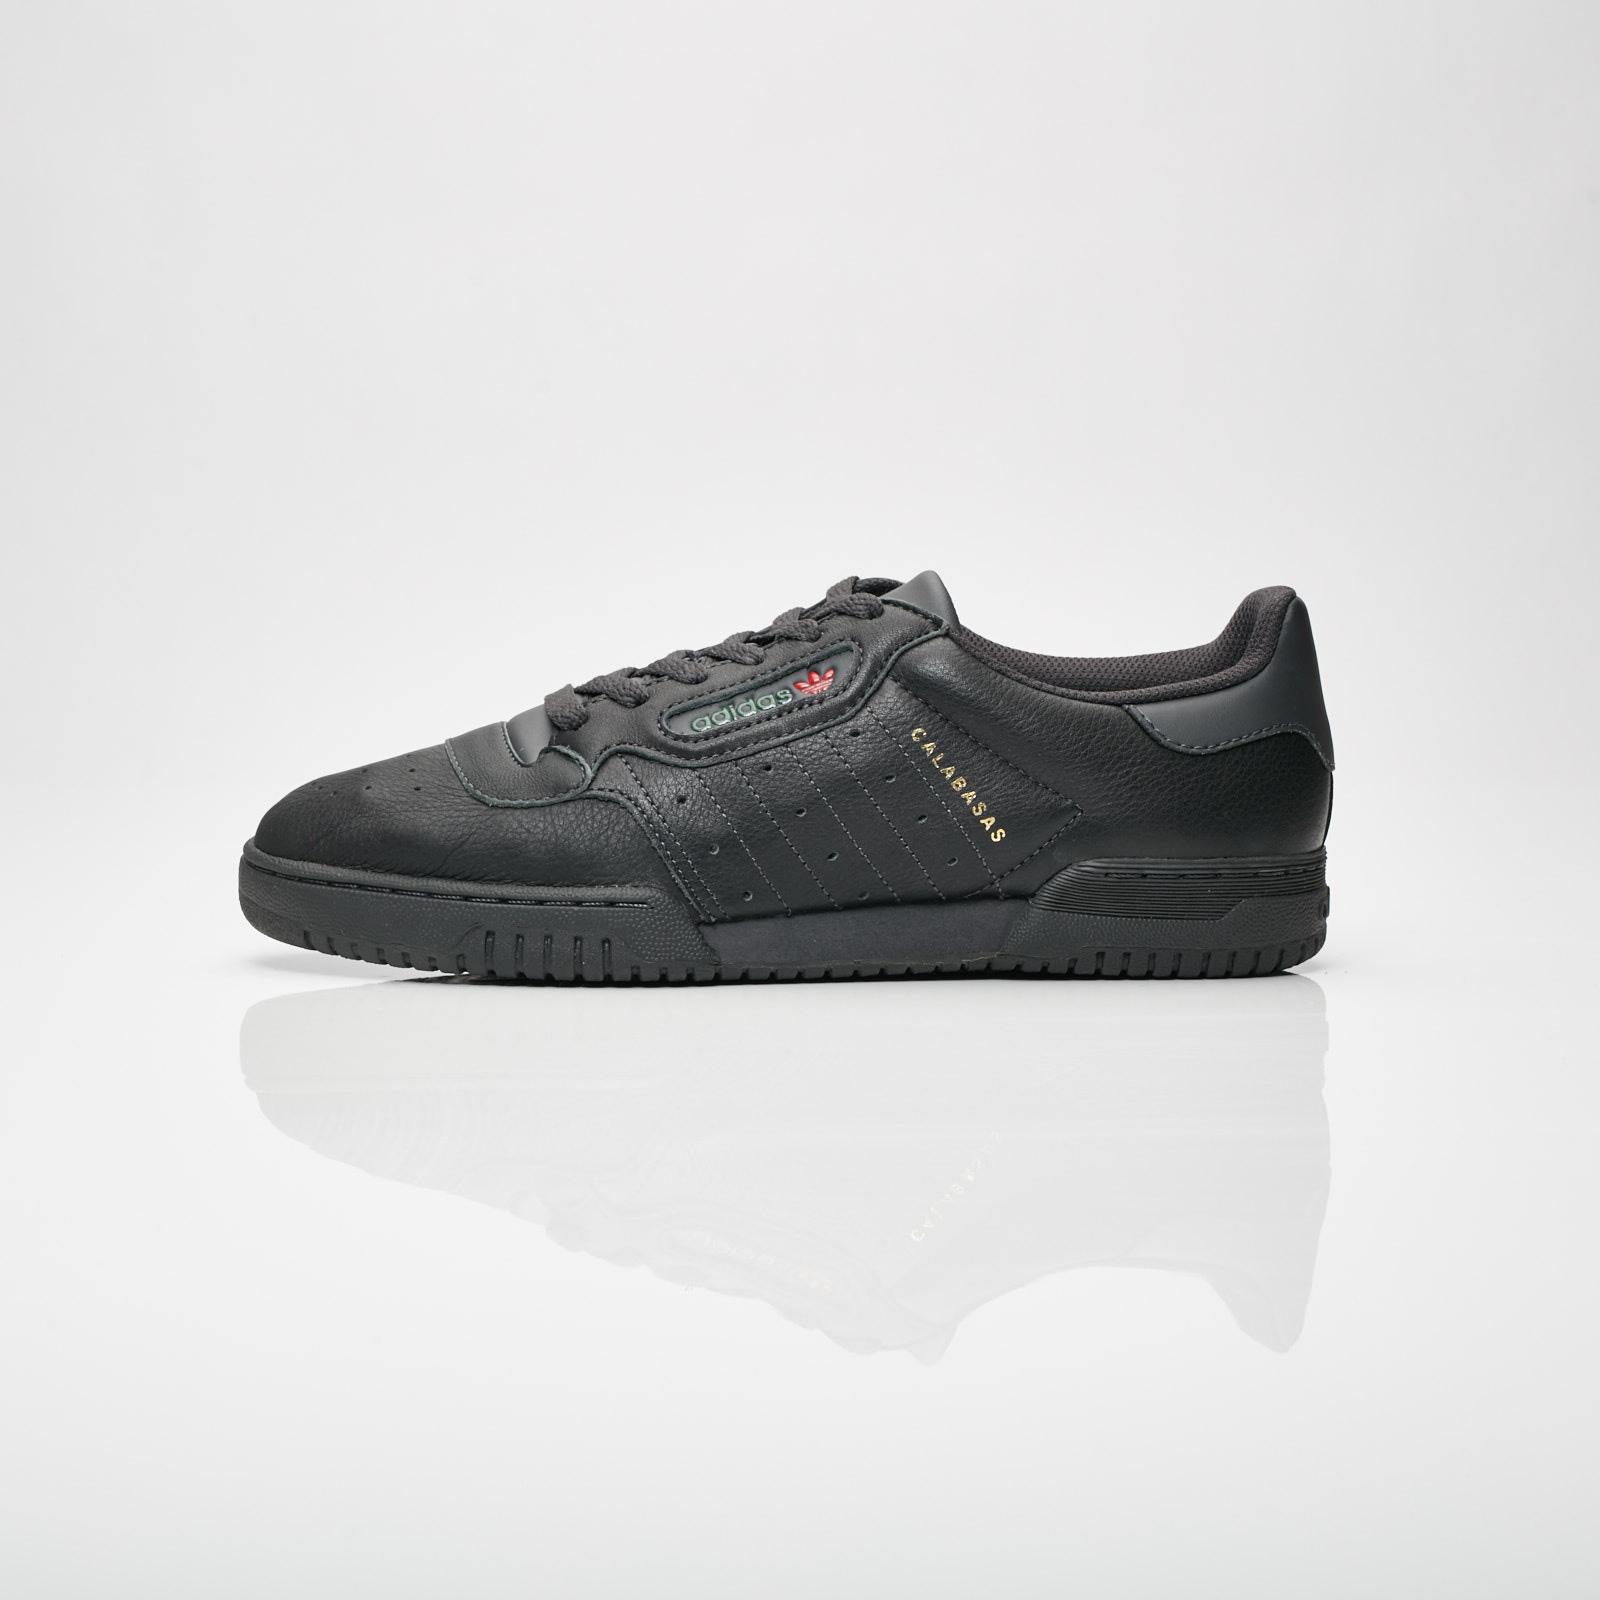 fcb904e57c59 ... adidas Originals x Kanye West Yeezy Powerphase ...